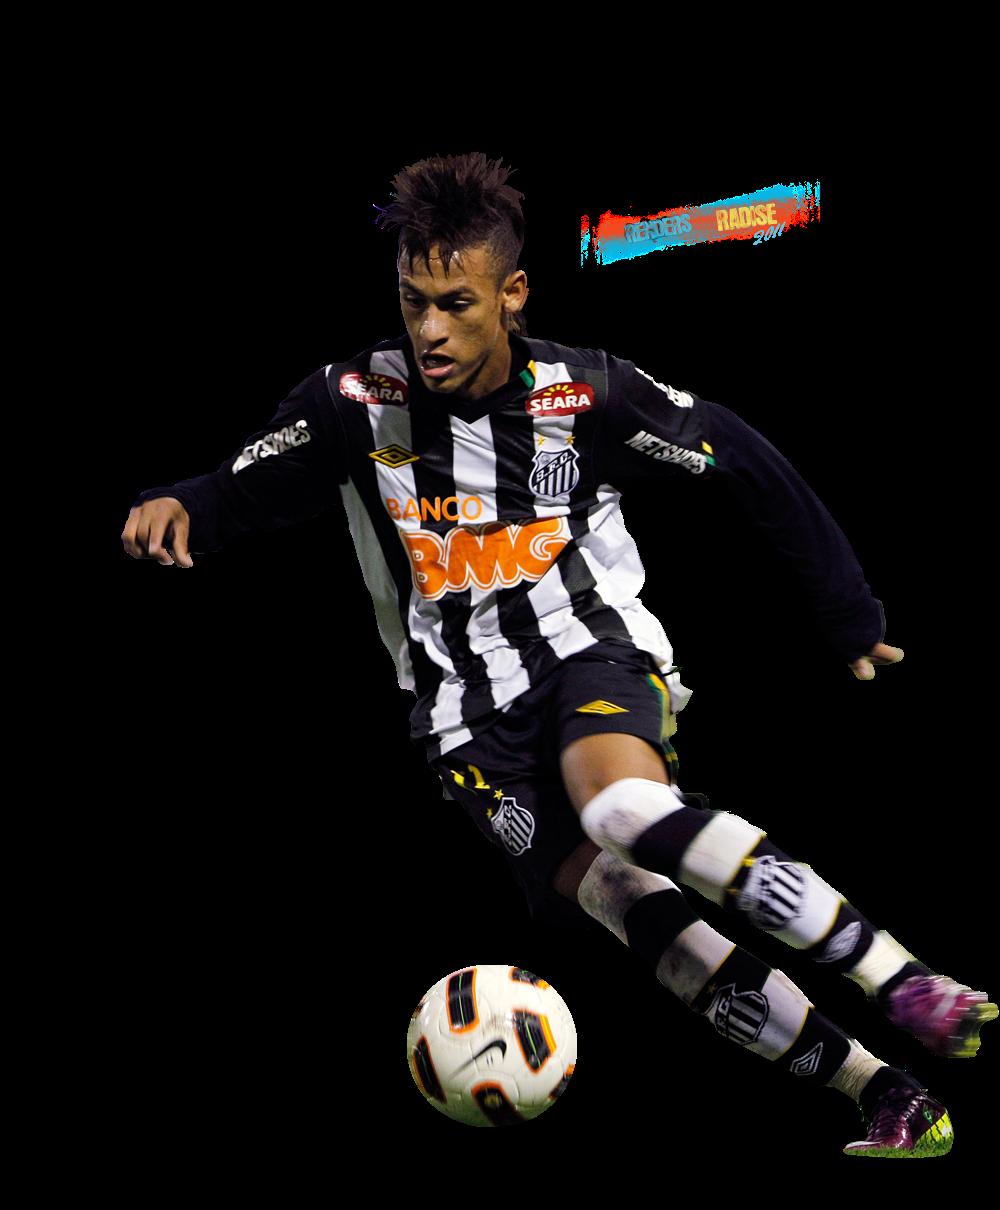 Neymar Da Silva Wife Neymar da silva santos jnior